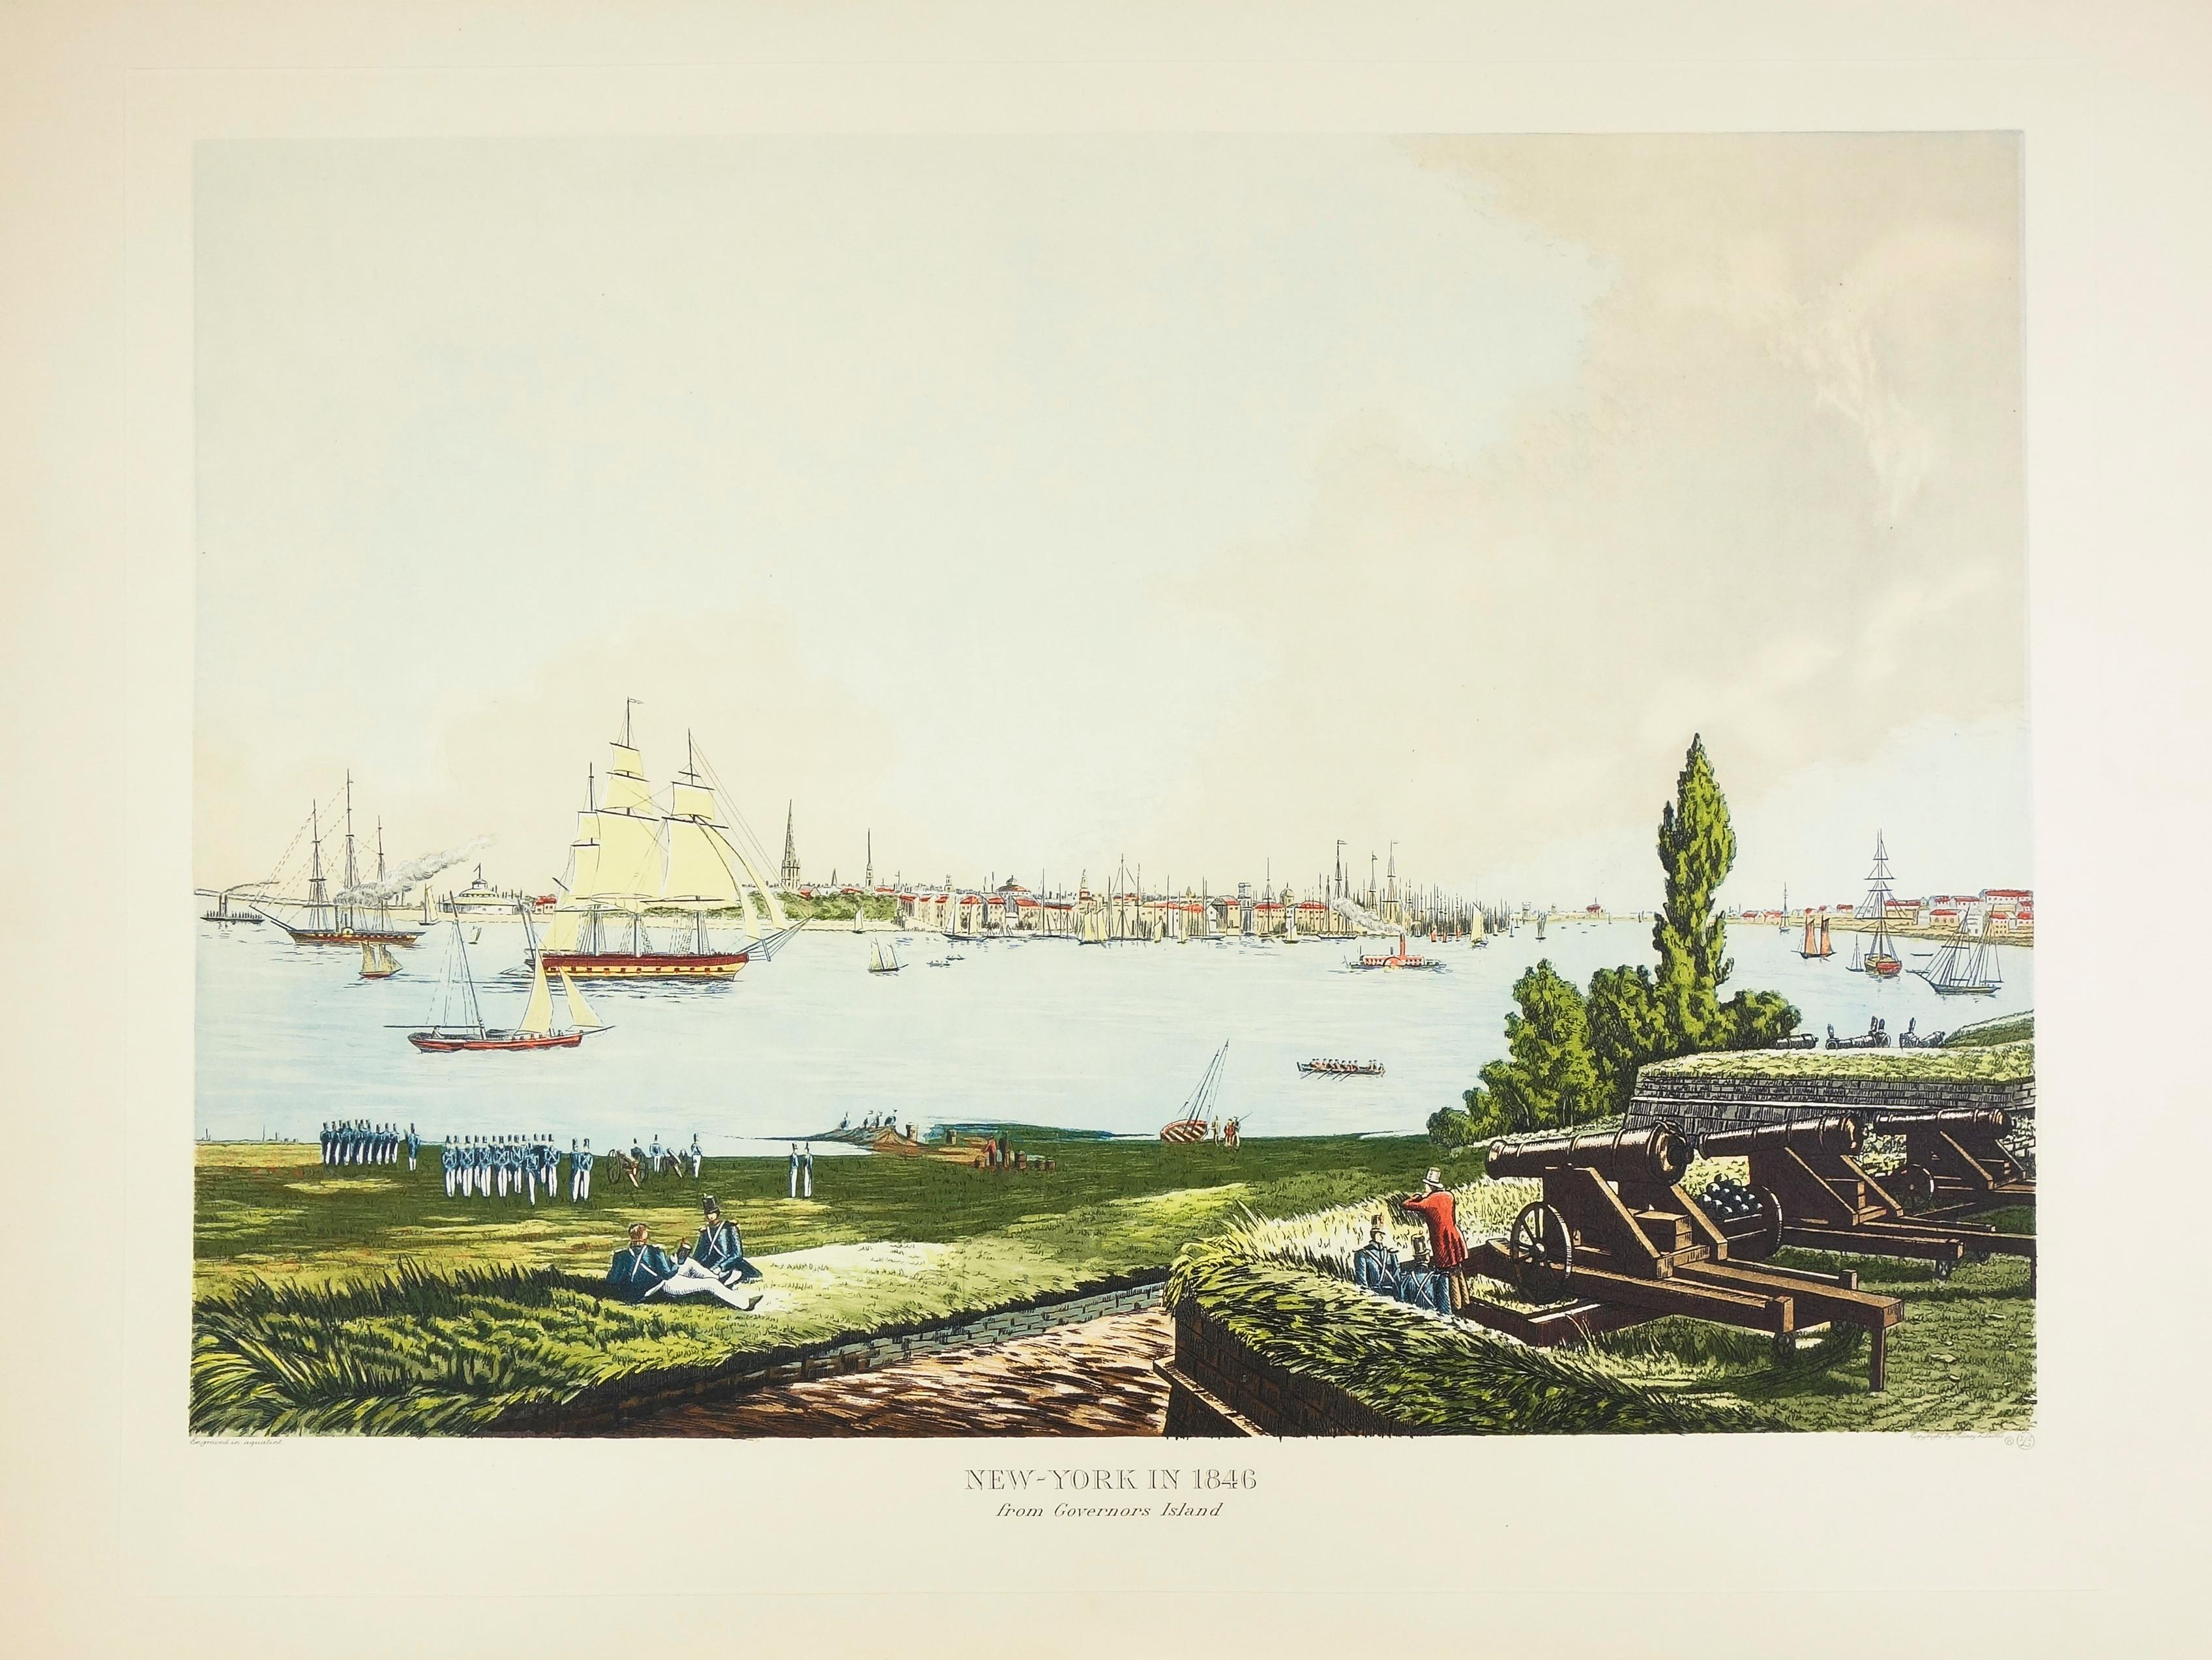 New York, Governor's Island, 1846